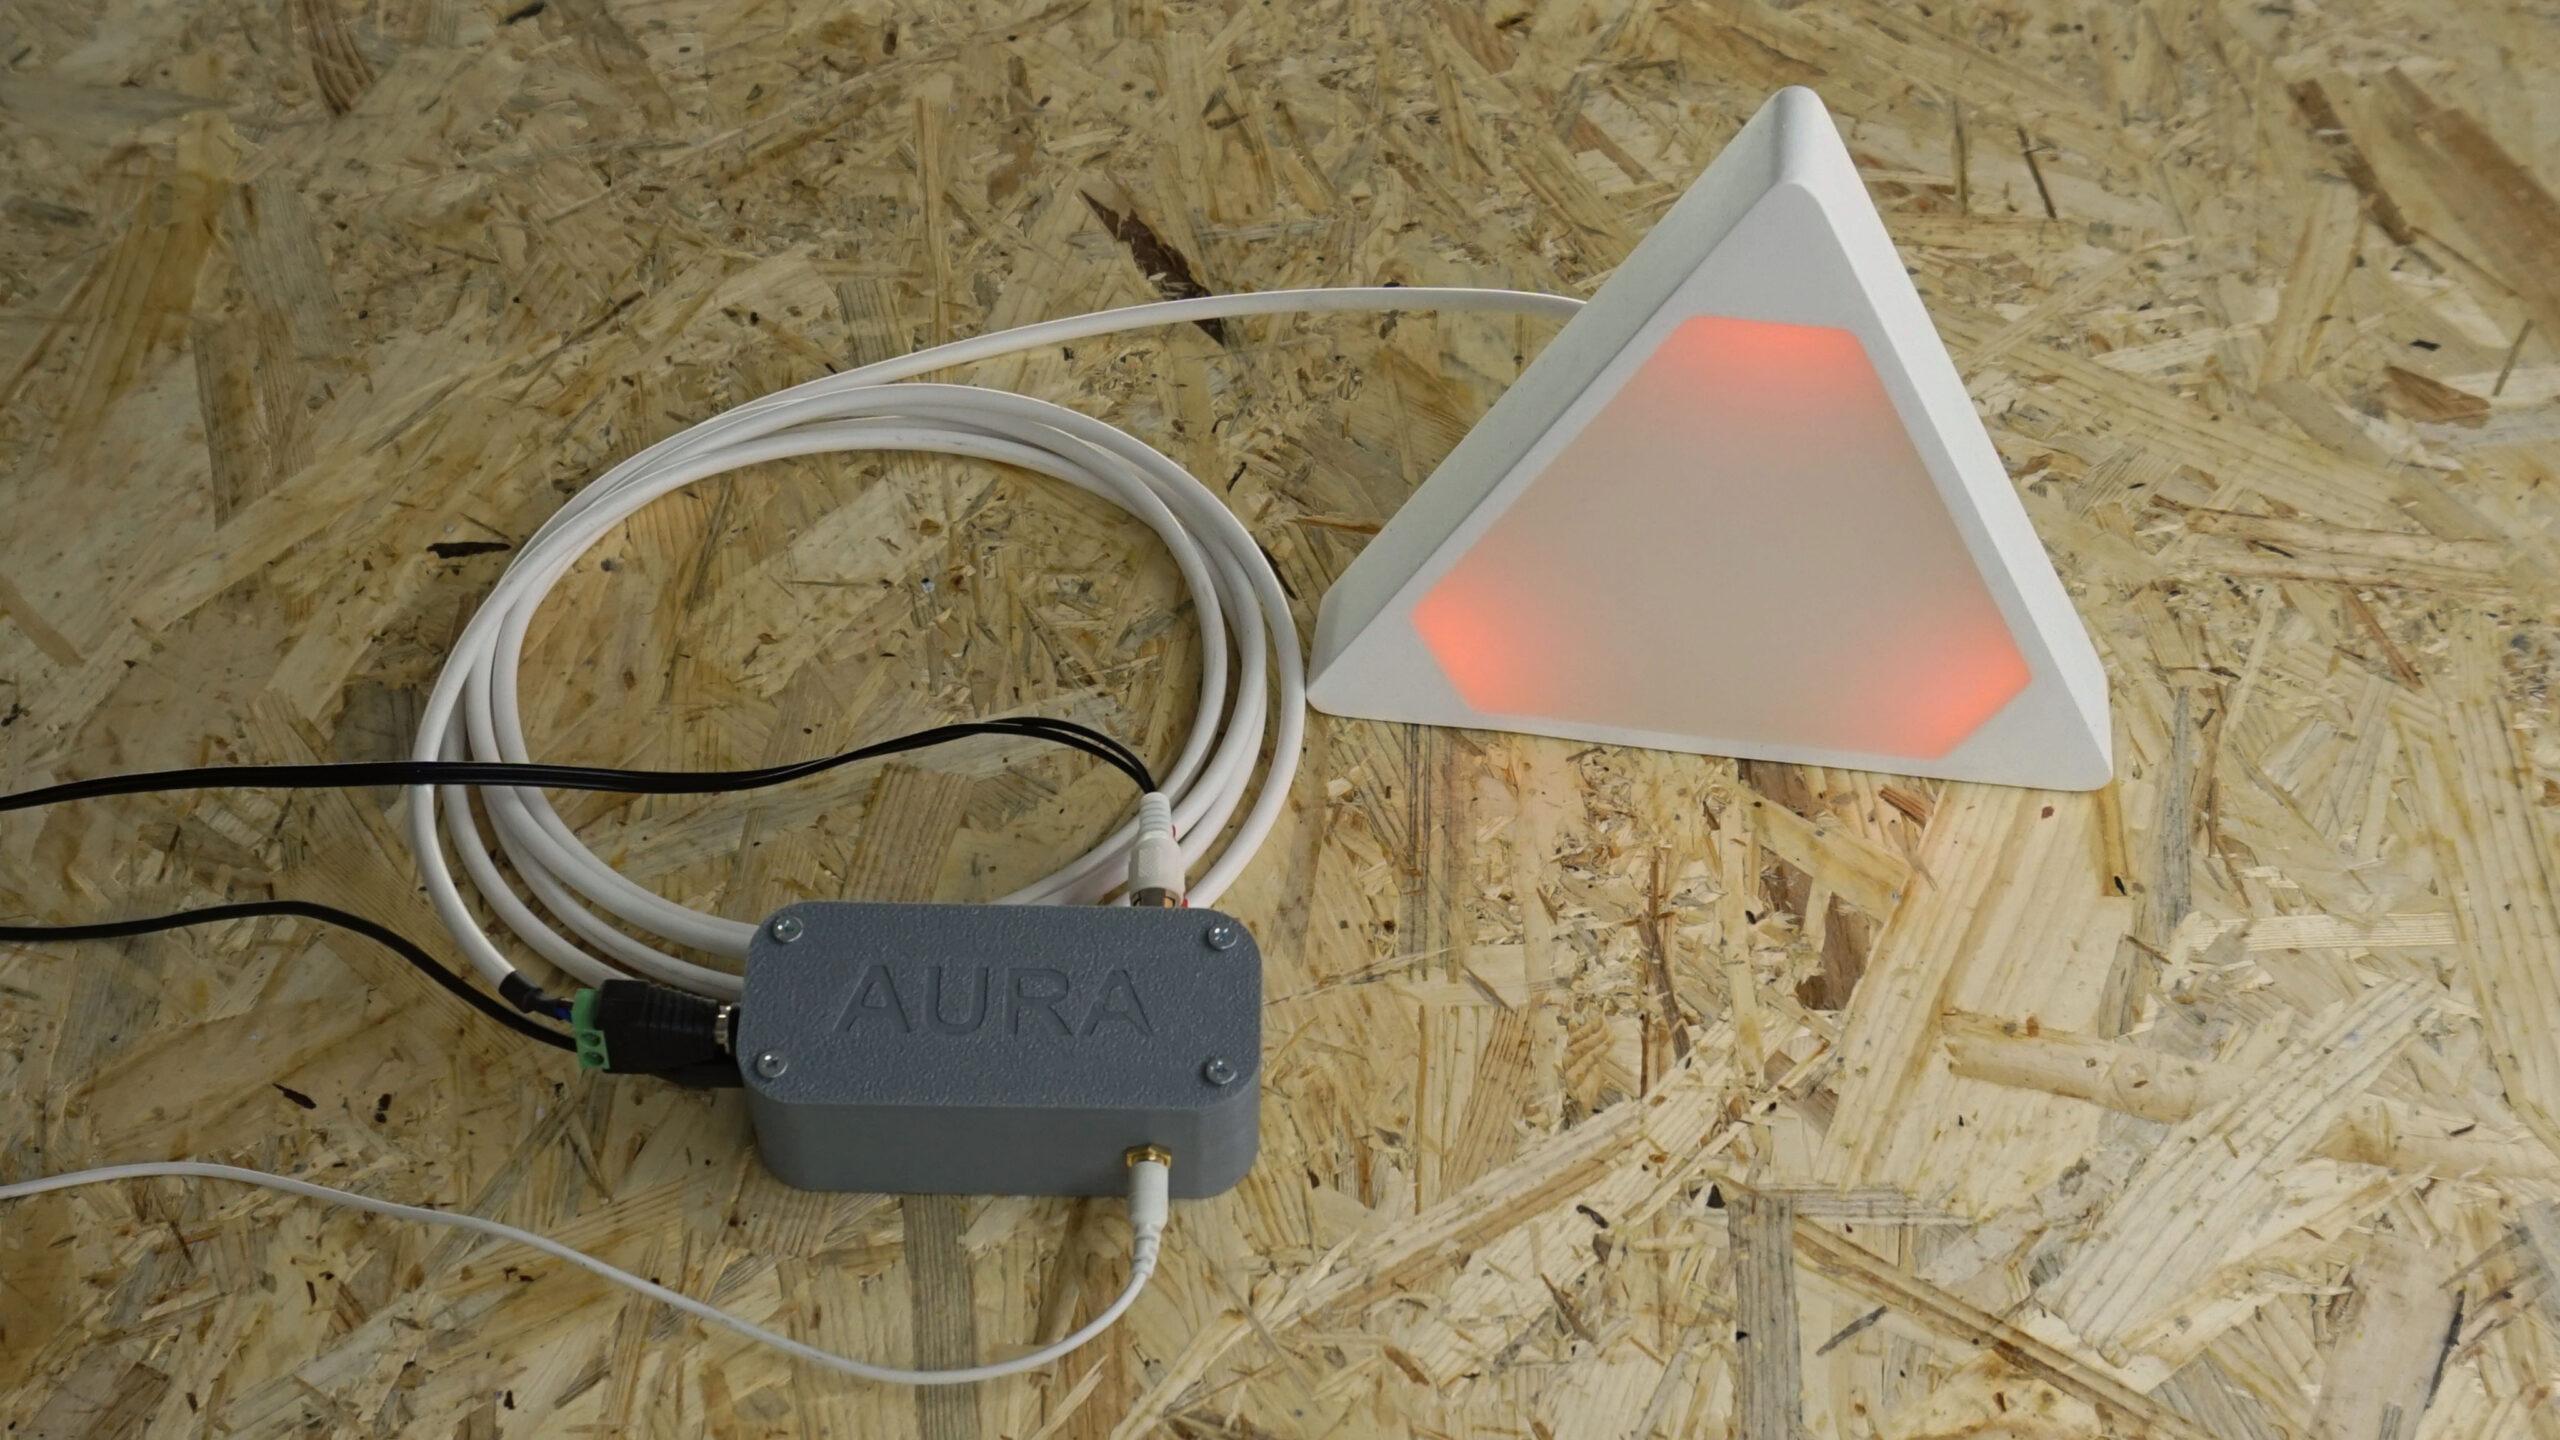 Aura - zapojení elektroniky